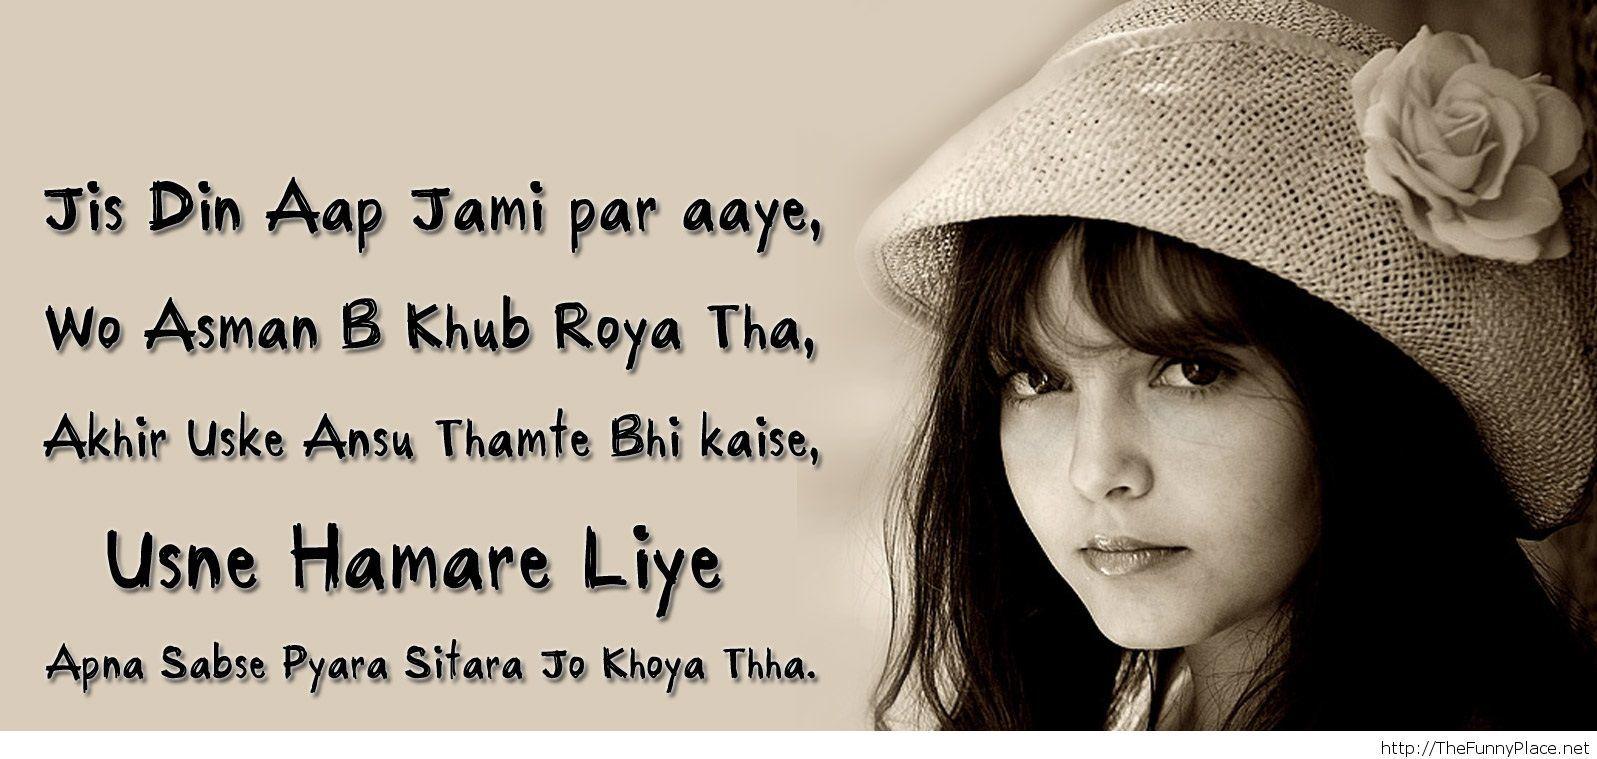 Romantic Quote With Wallpaper - Best Ever Love Shayari - HD Wallpaper